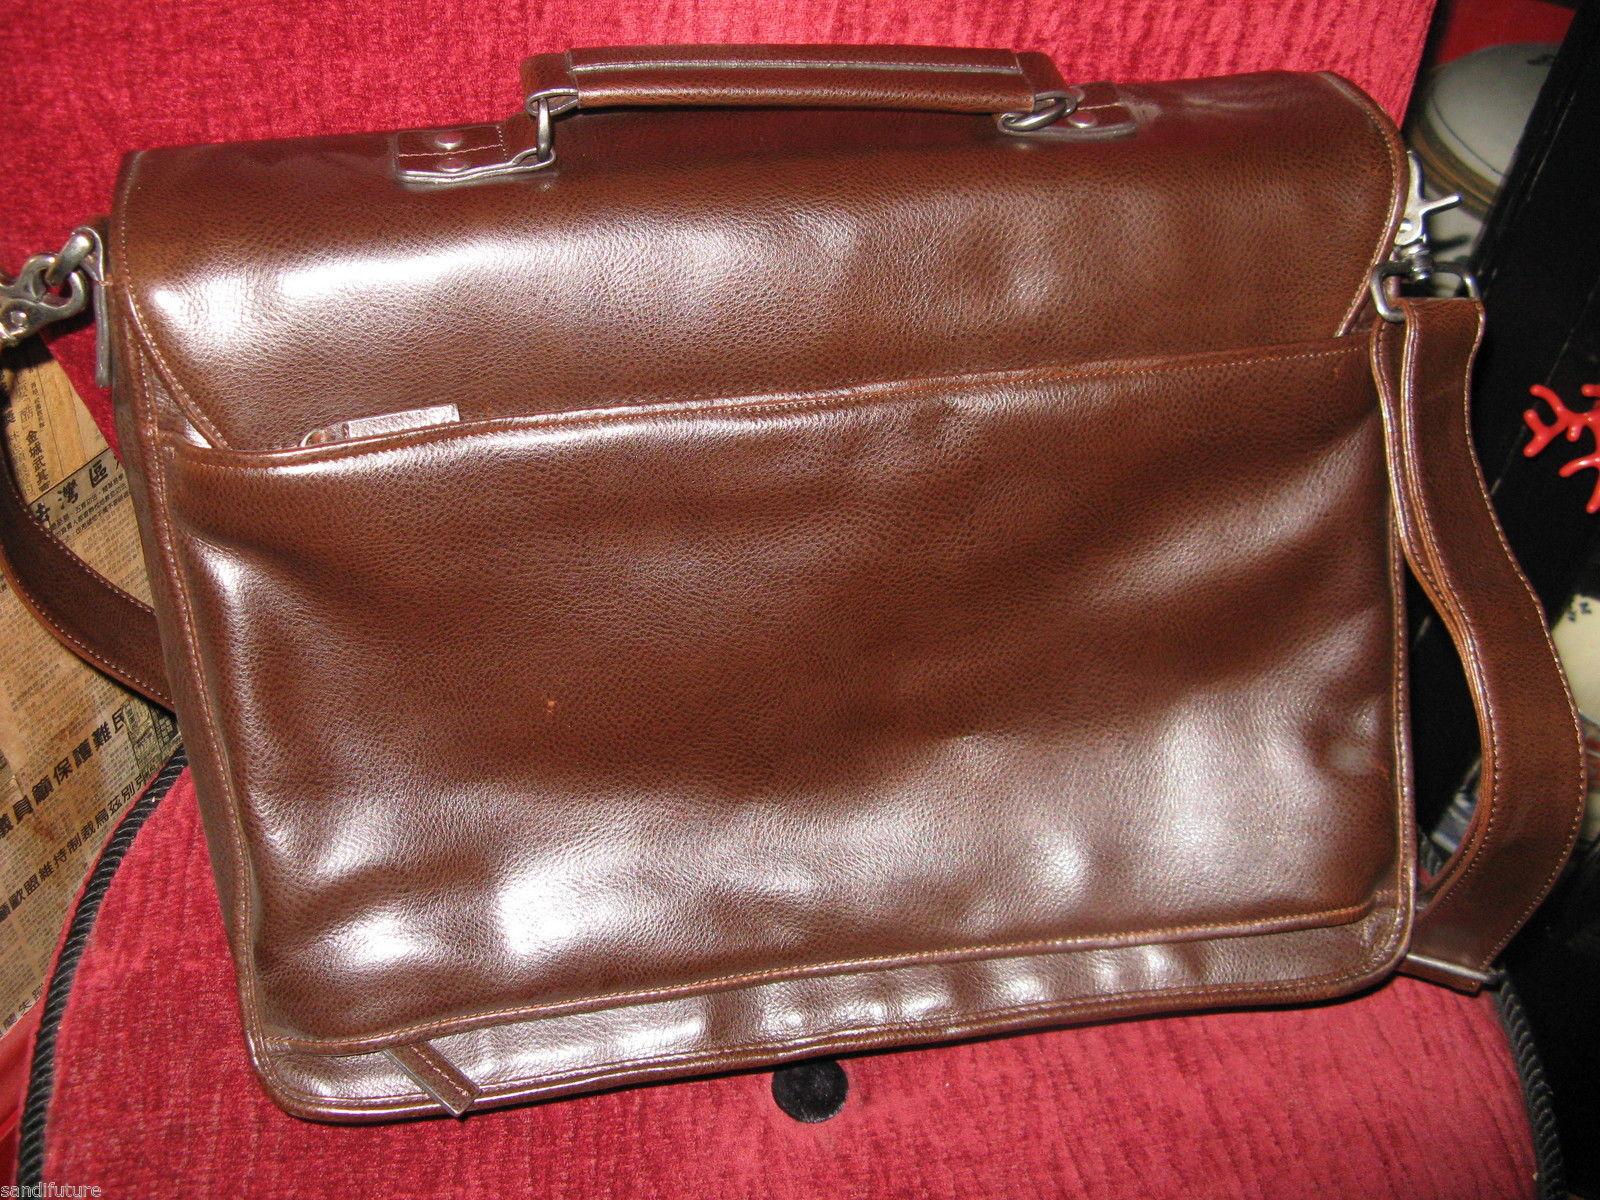 Ellington Portland Belmont classic travel vintage brown leather briefcase as-is image 2